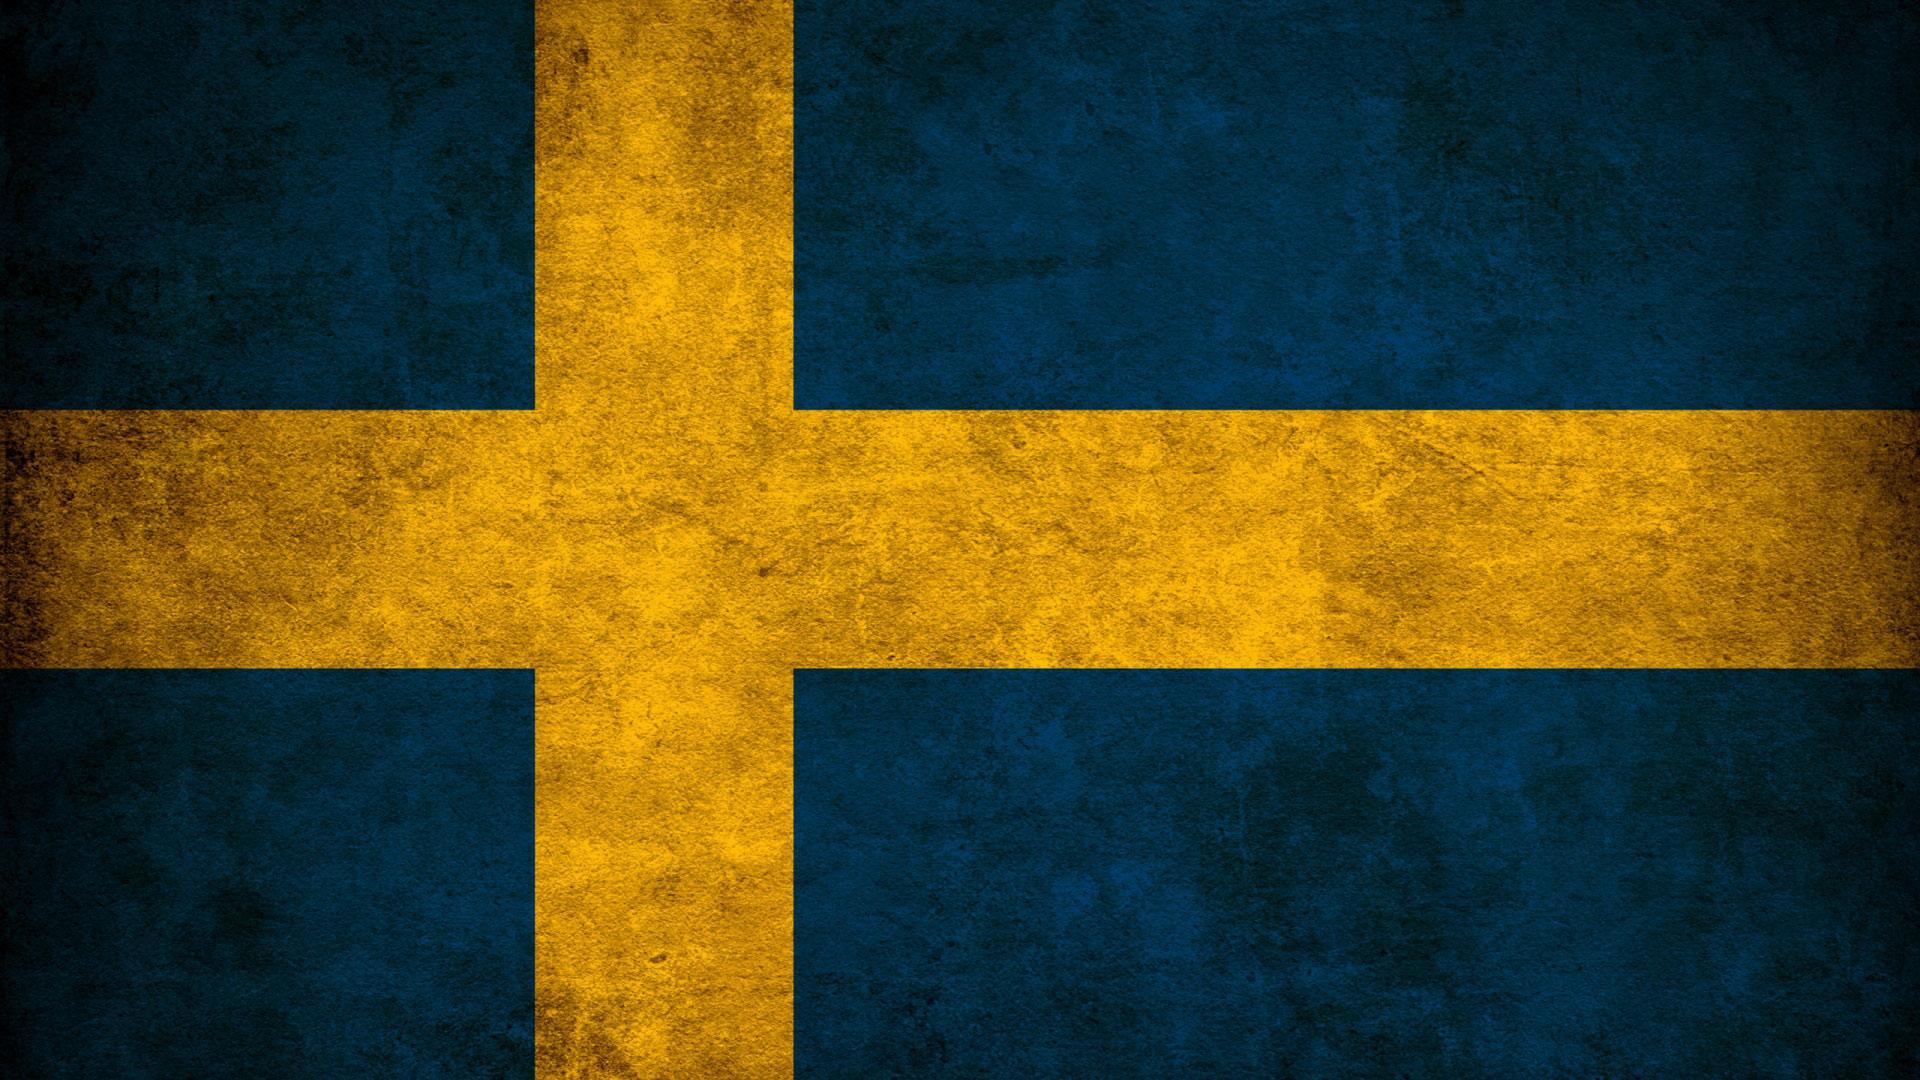 Гранжевый шведский флаг